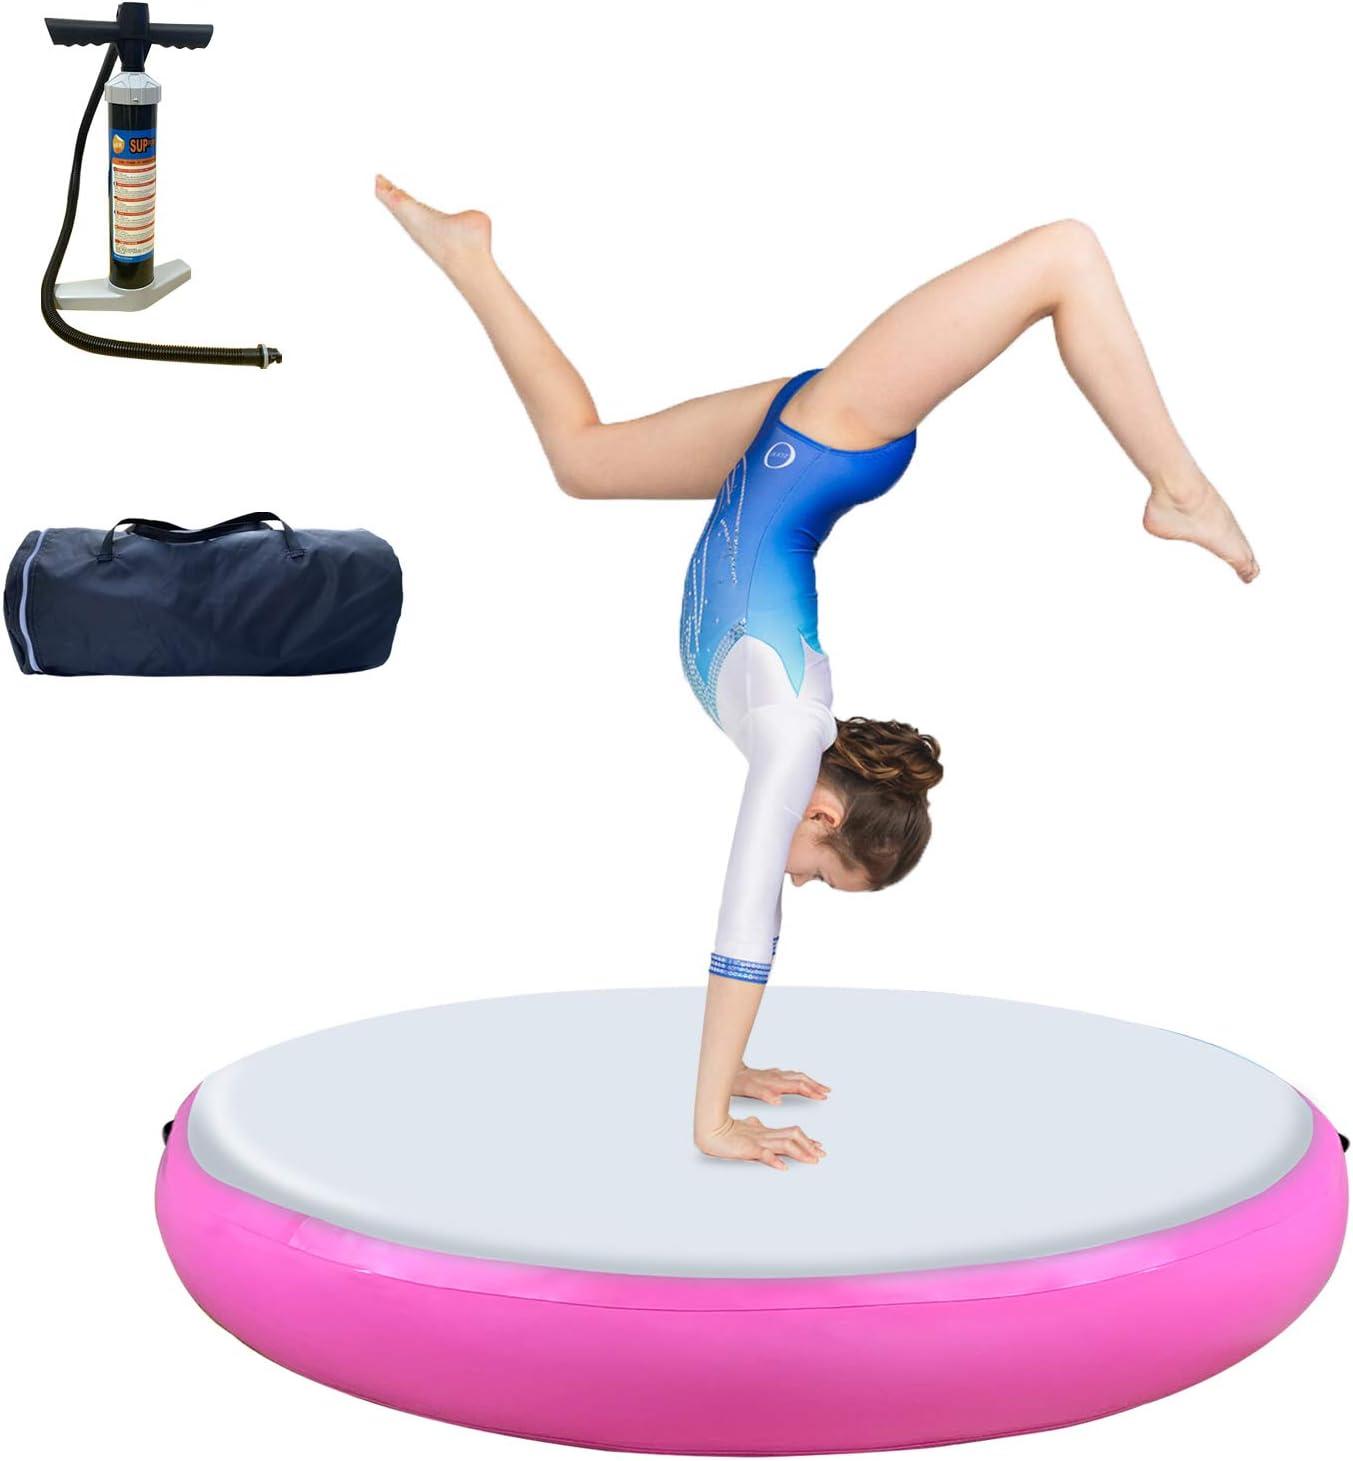 Gymnastics Mats Series Air Roller Air Block Air Spot Inflatable Tumbling Mat, Air Barrel Tumble Track Gymnastic Equipment for Gym Home Use Training Cheerleading Yoga